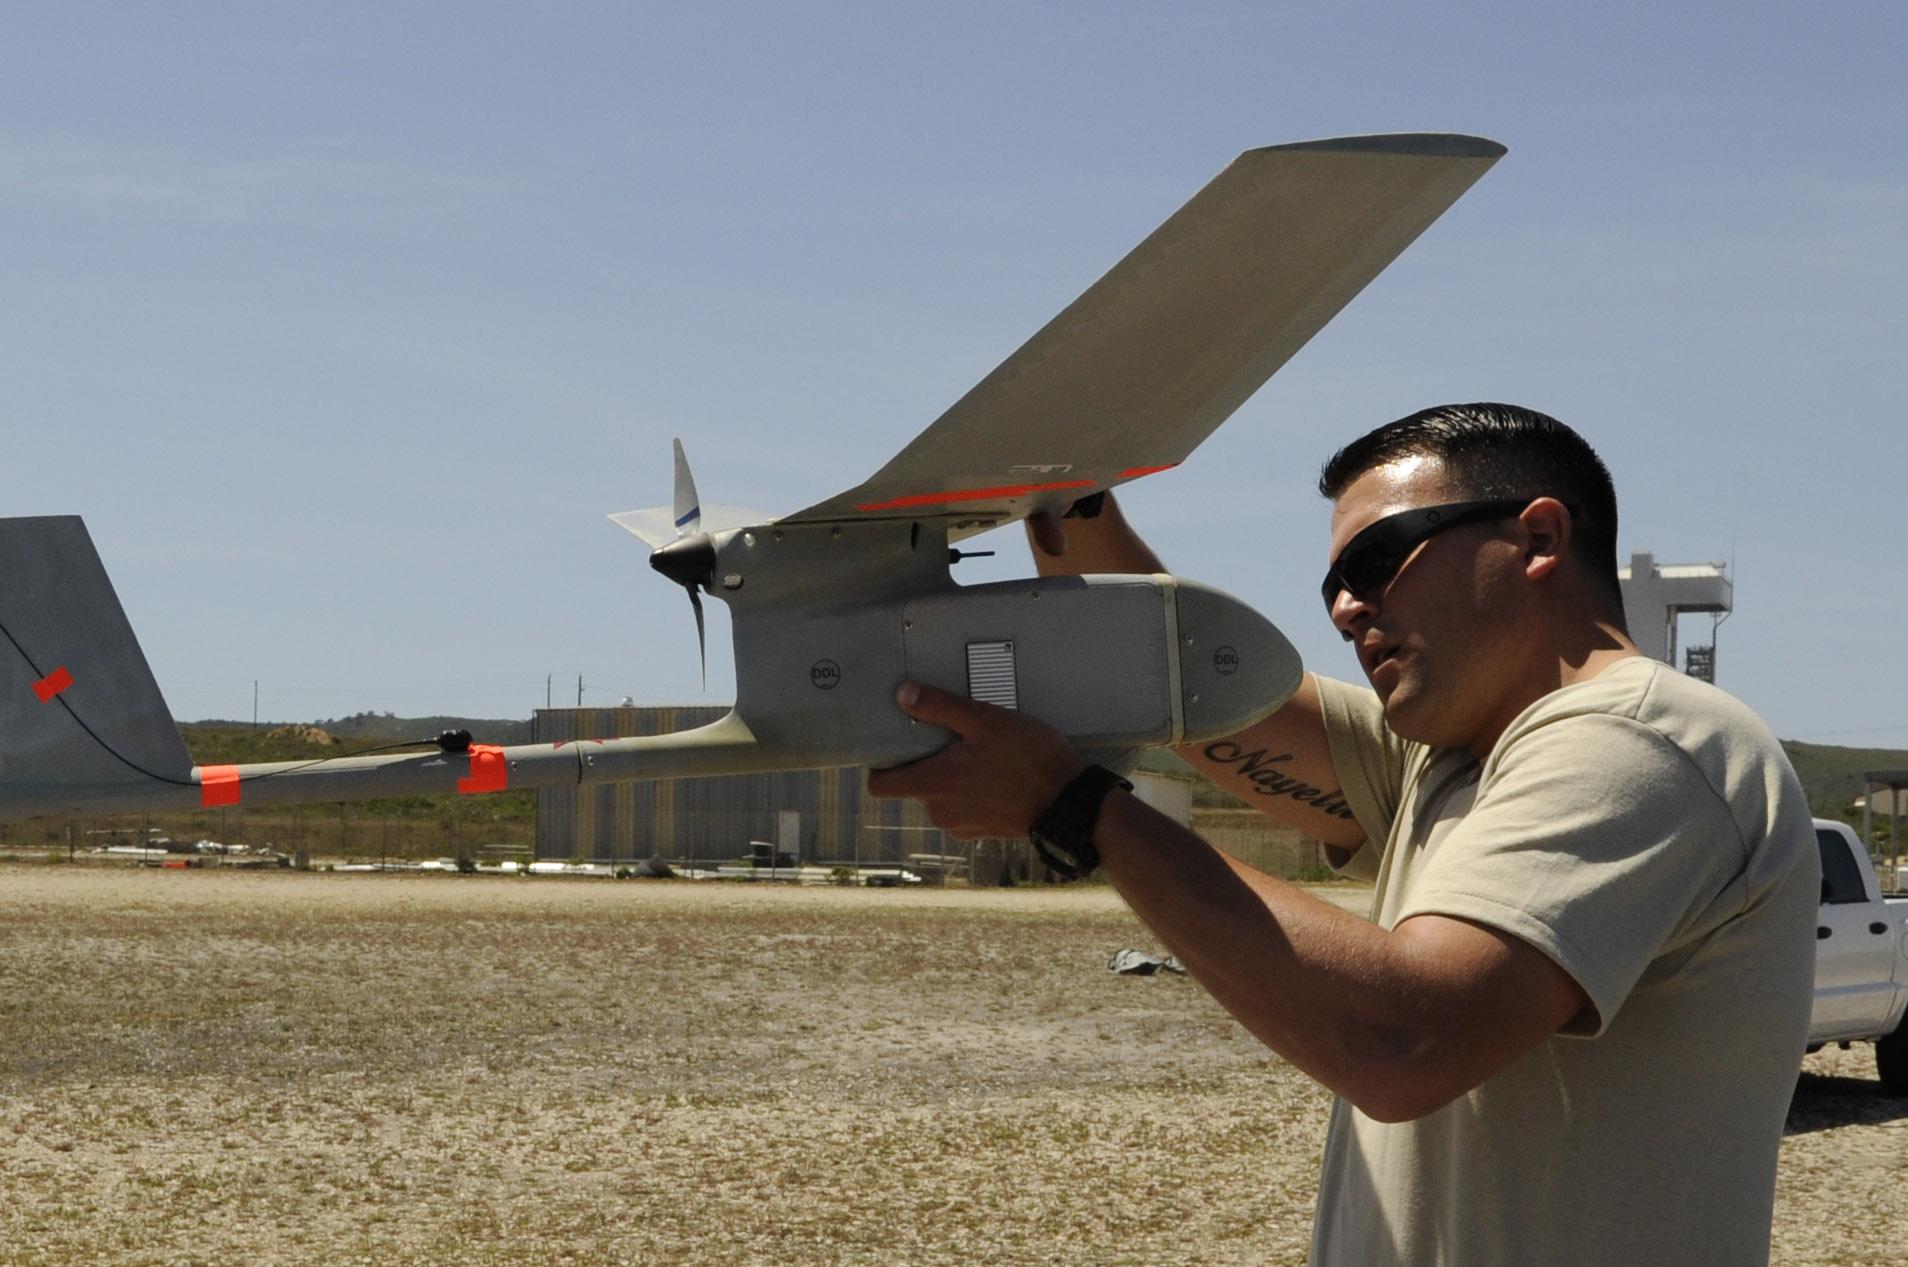 RQ-11 Raven - Pre-flight check-up